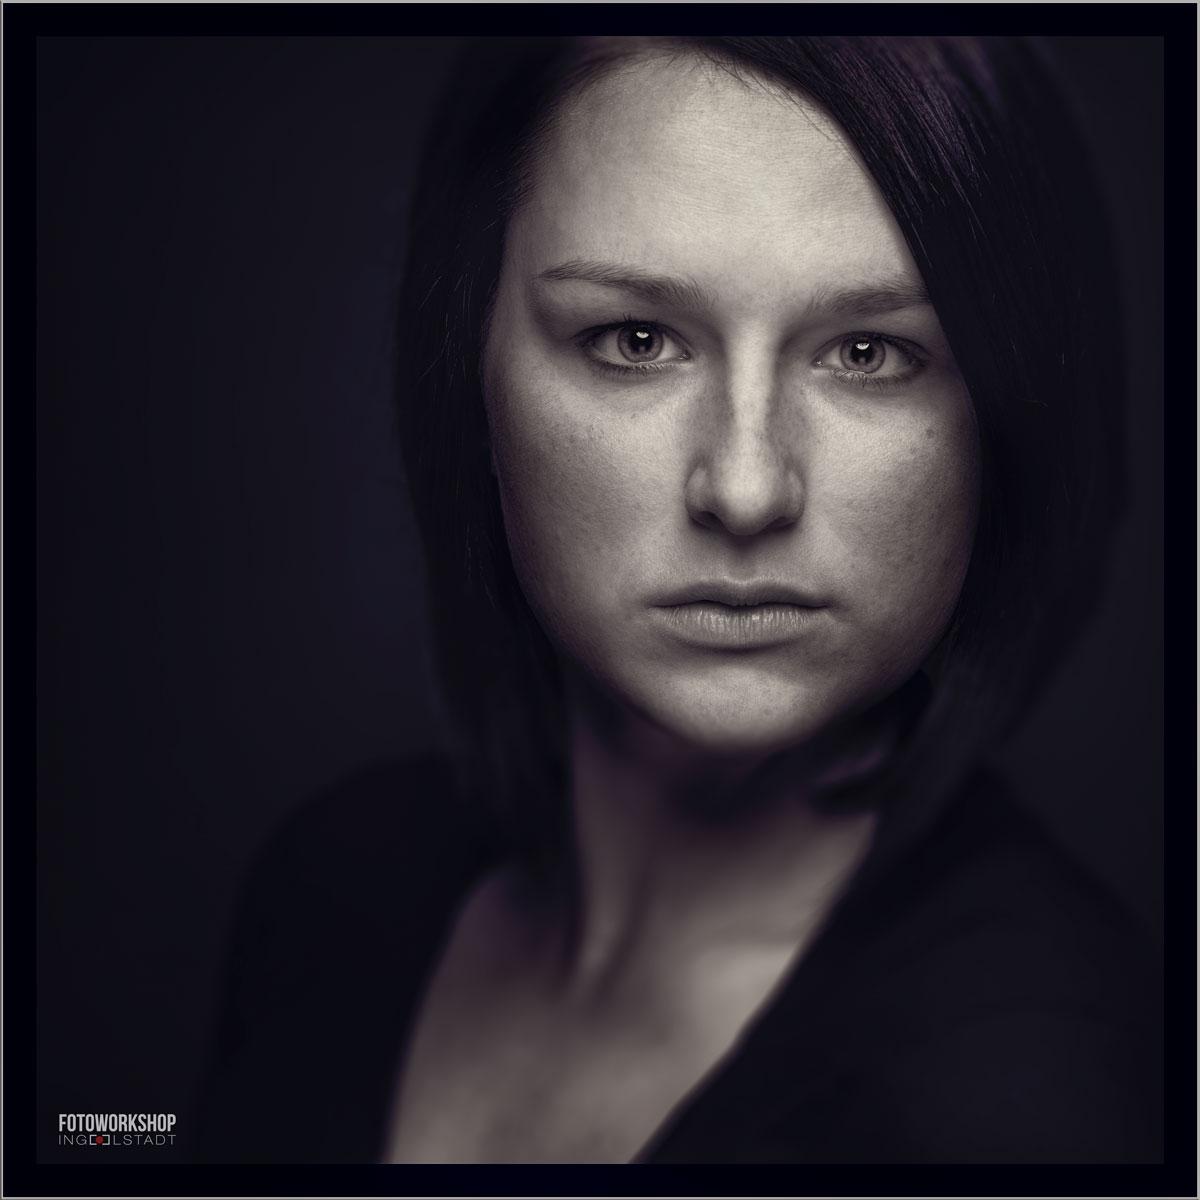 Shooting Portrait Cindy Schwarzweiss